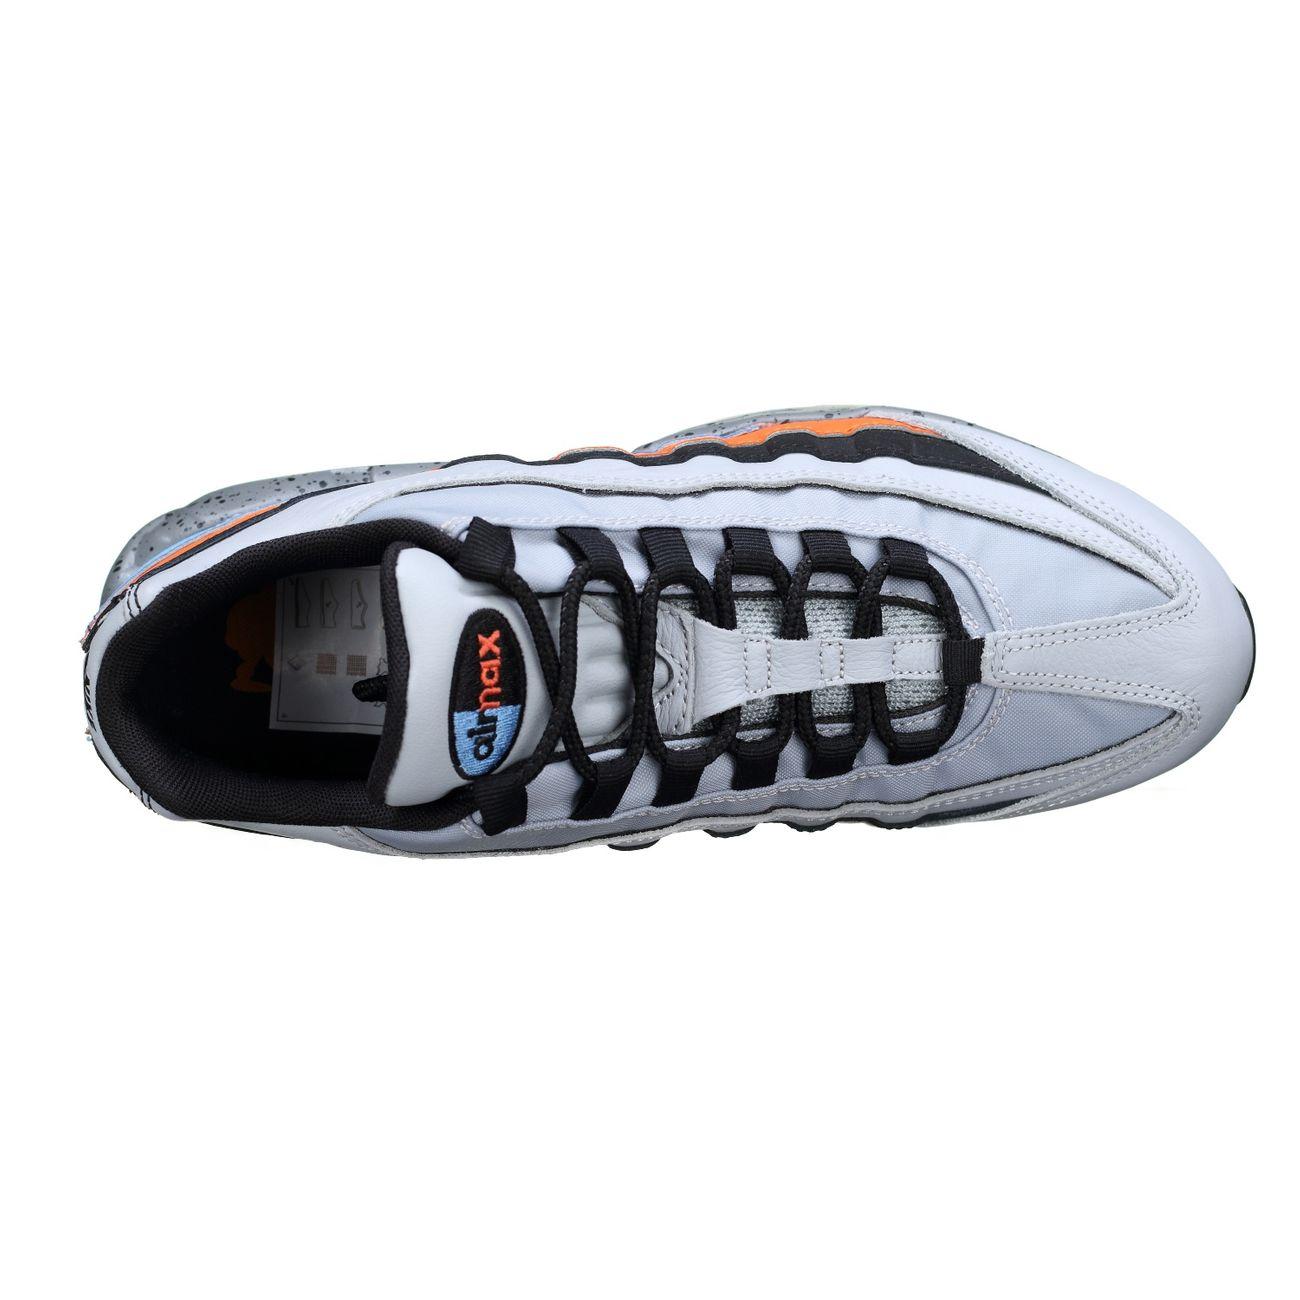 Cher Nike Pour Bleu Air Max 95 Basket Pas Femme lJc3TFK1